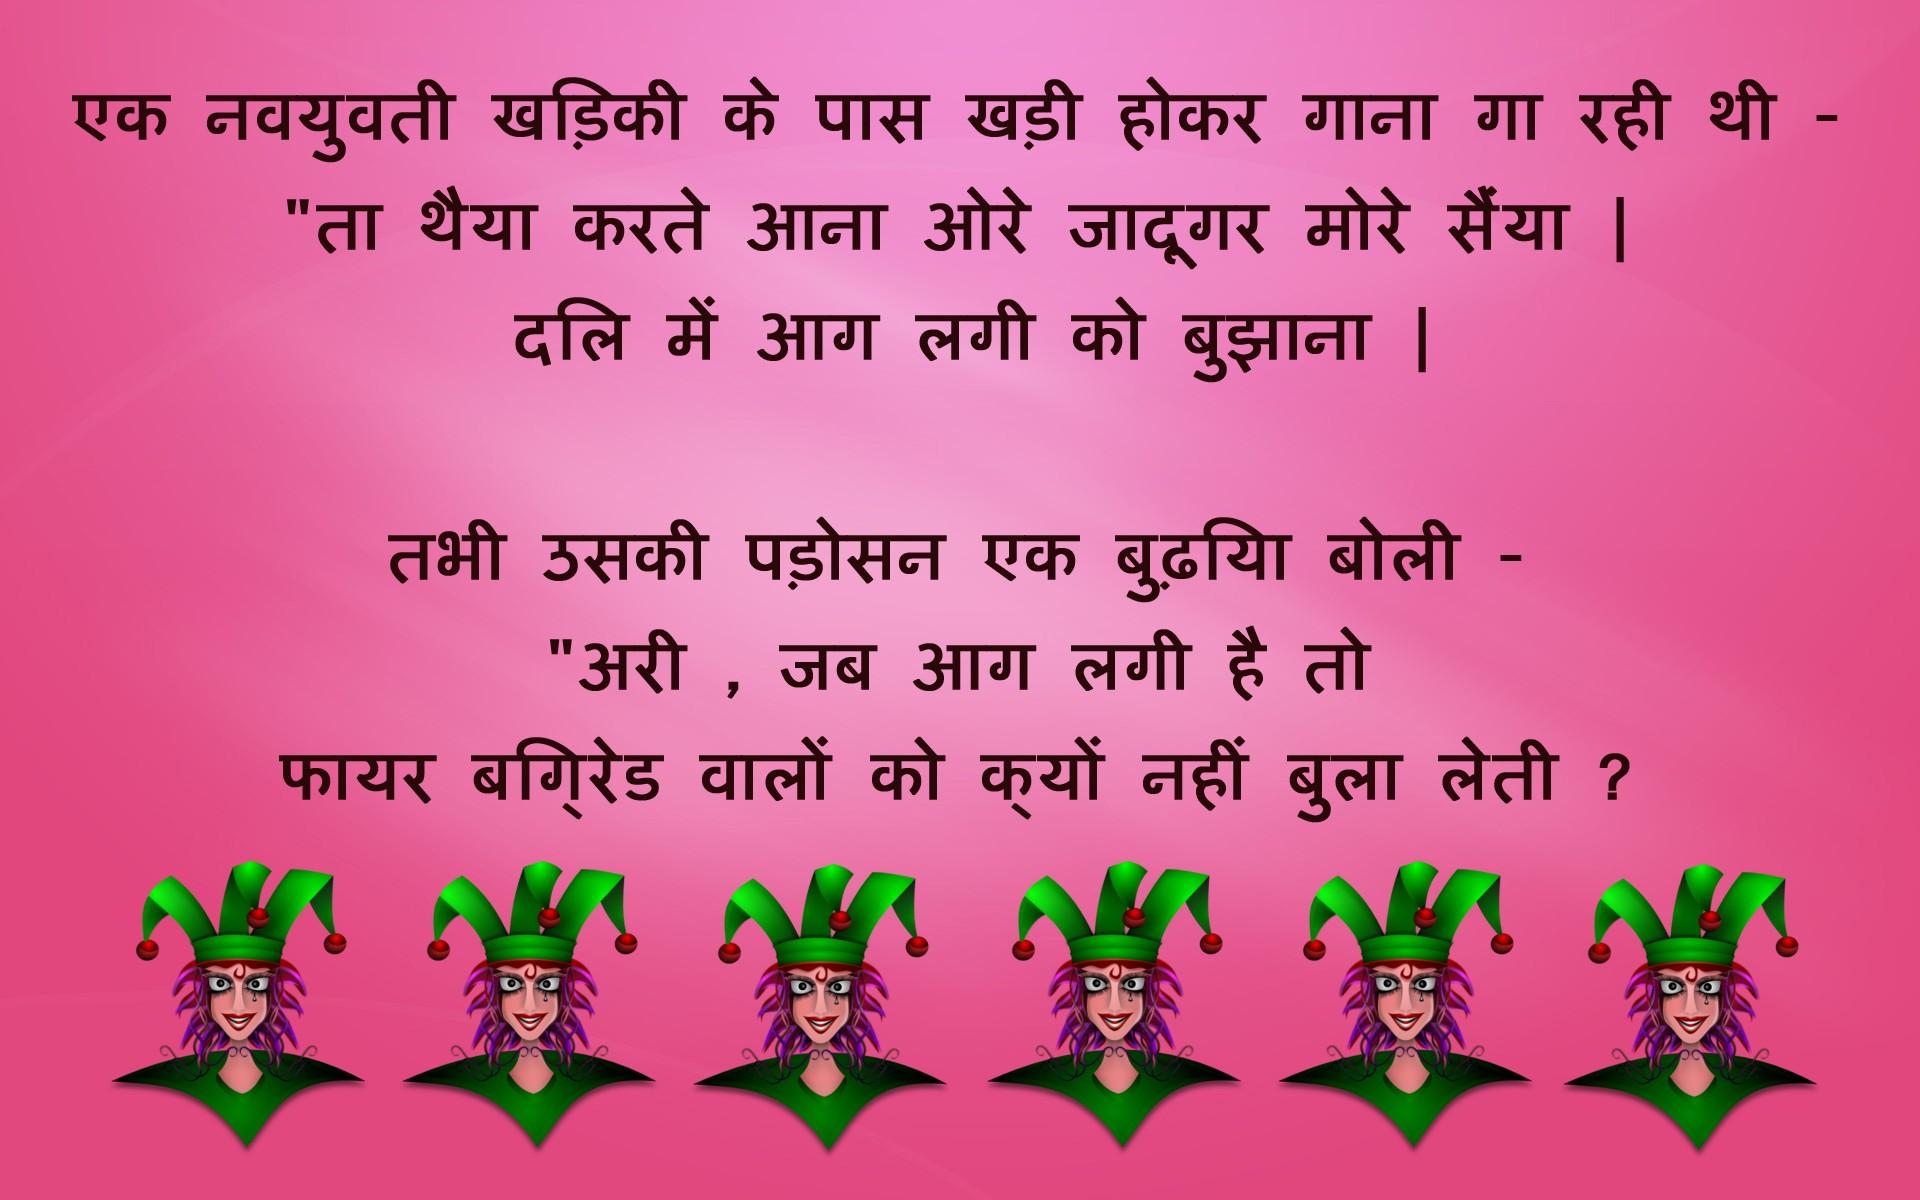 Girls Funny Chutkule Jokes Free Wallpaper Download Free Download Hindi Jokes 1920x1200 Download Hd Wallpaper Wallpapertip